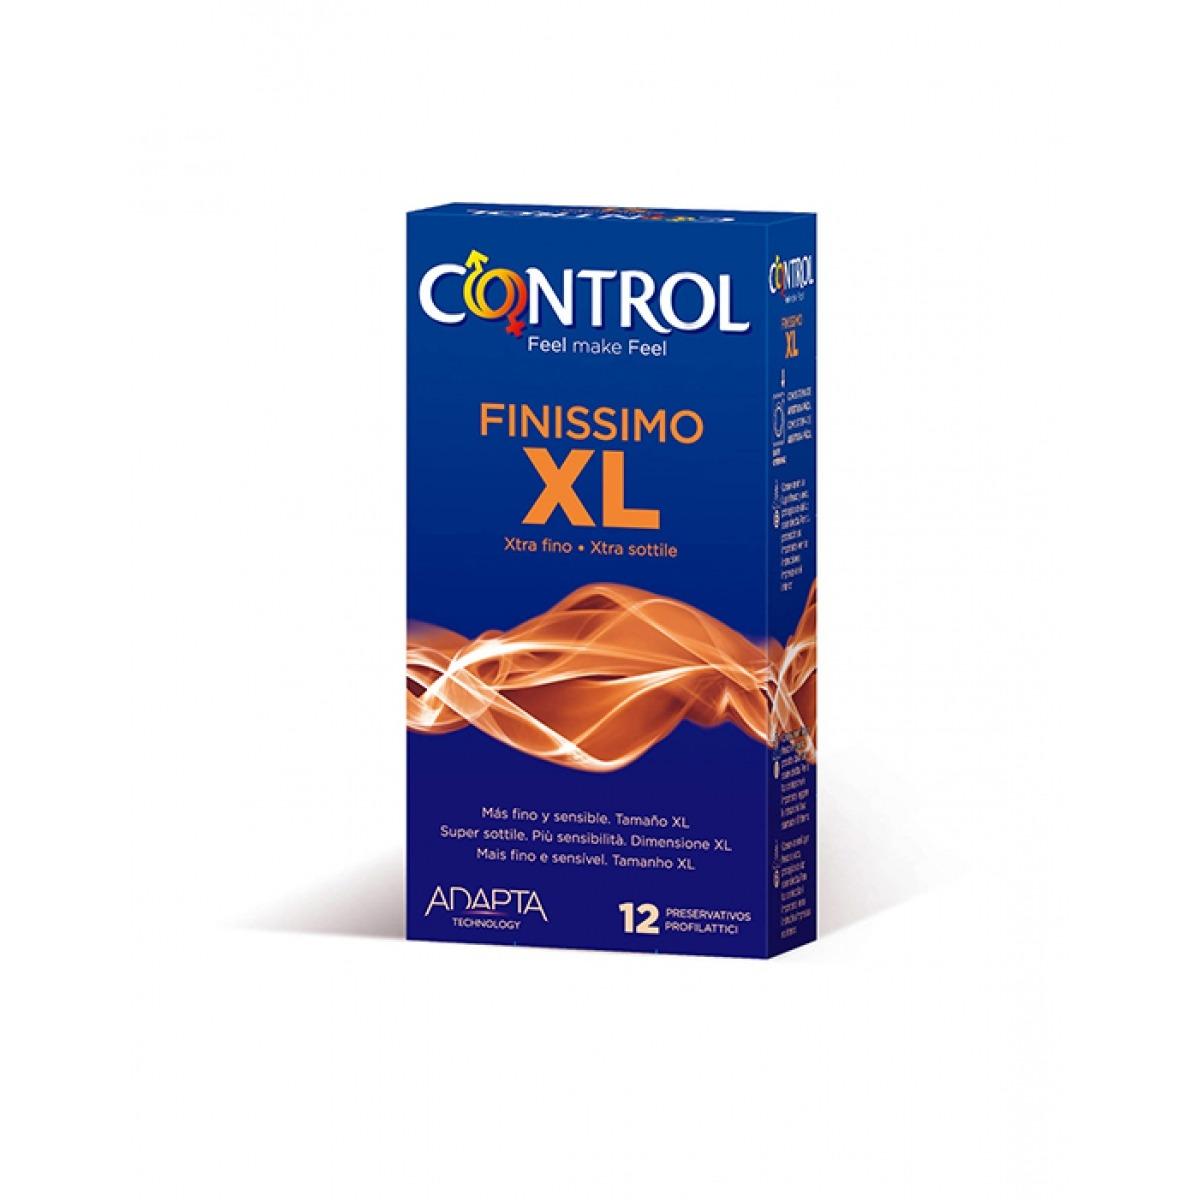 PRESERVATIVOS CONTROL FINISSIMO XL 12 UNIDADES